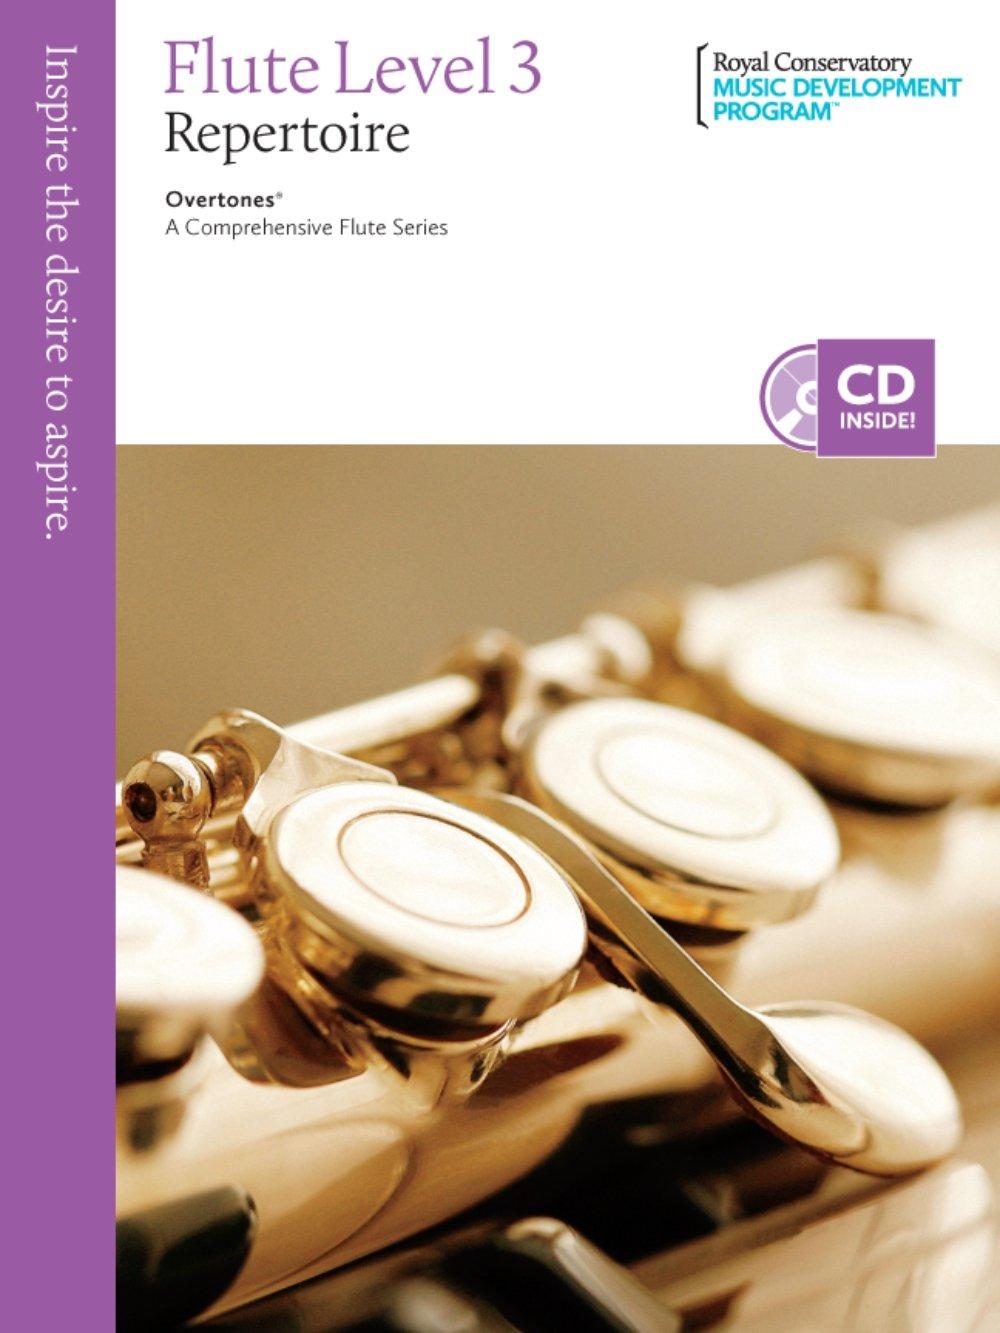 Flute Repertoire 3 (Overtones: A Comprehensive Flute Series) PDF